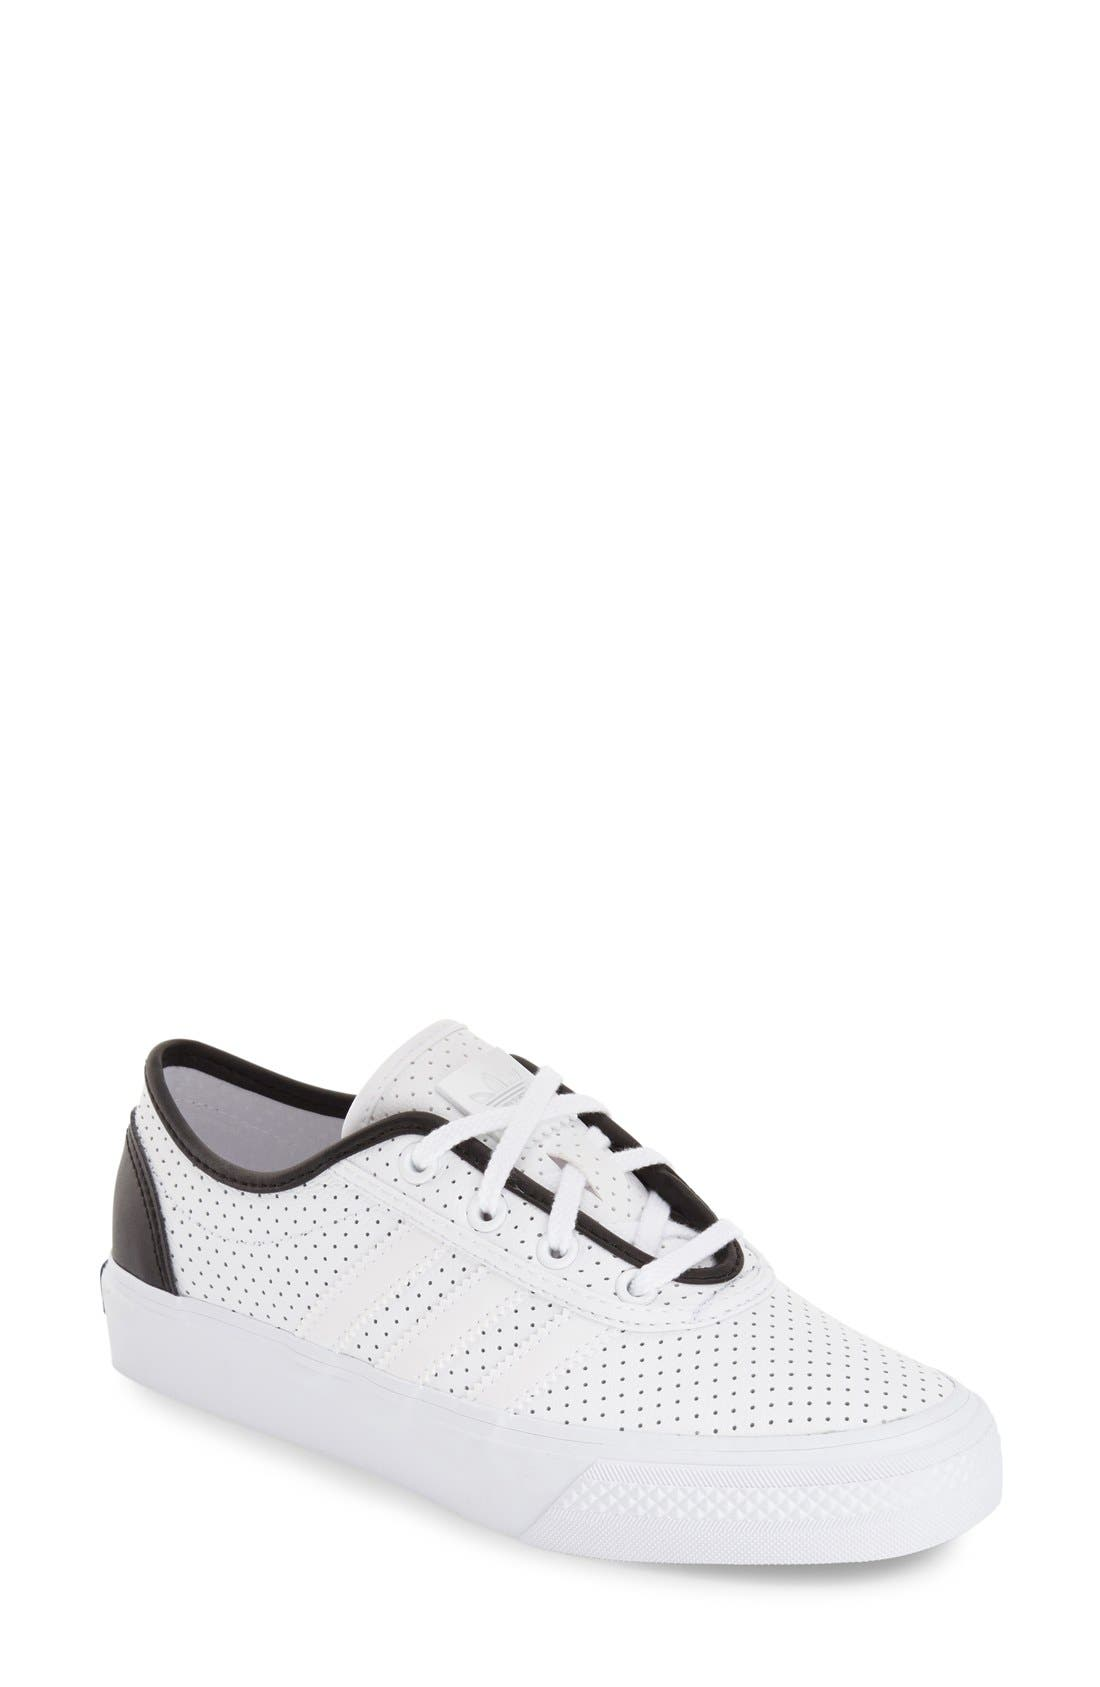 Main Image - adidas 'Adi Ease' Sneaker (Women)